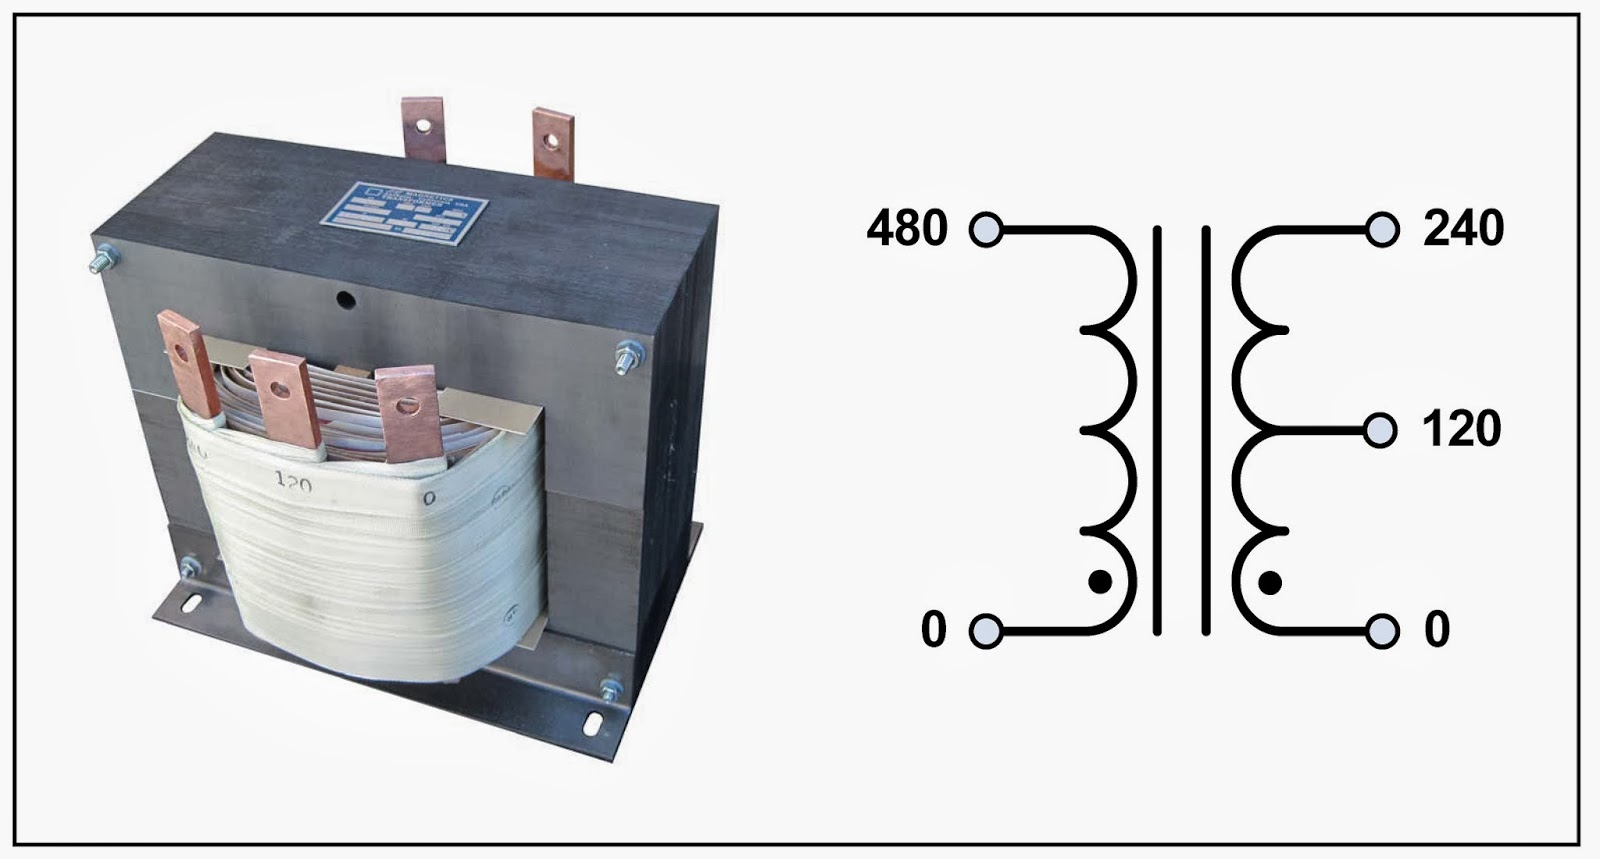 centre tap transformer 15 kva p n 18864 input 480 vac output 120 240 vac [ 1600 x 859 Pixel ]